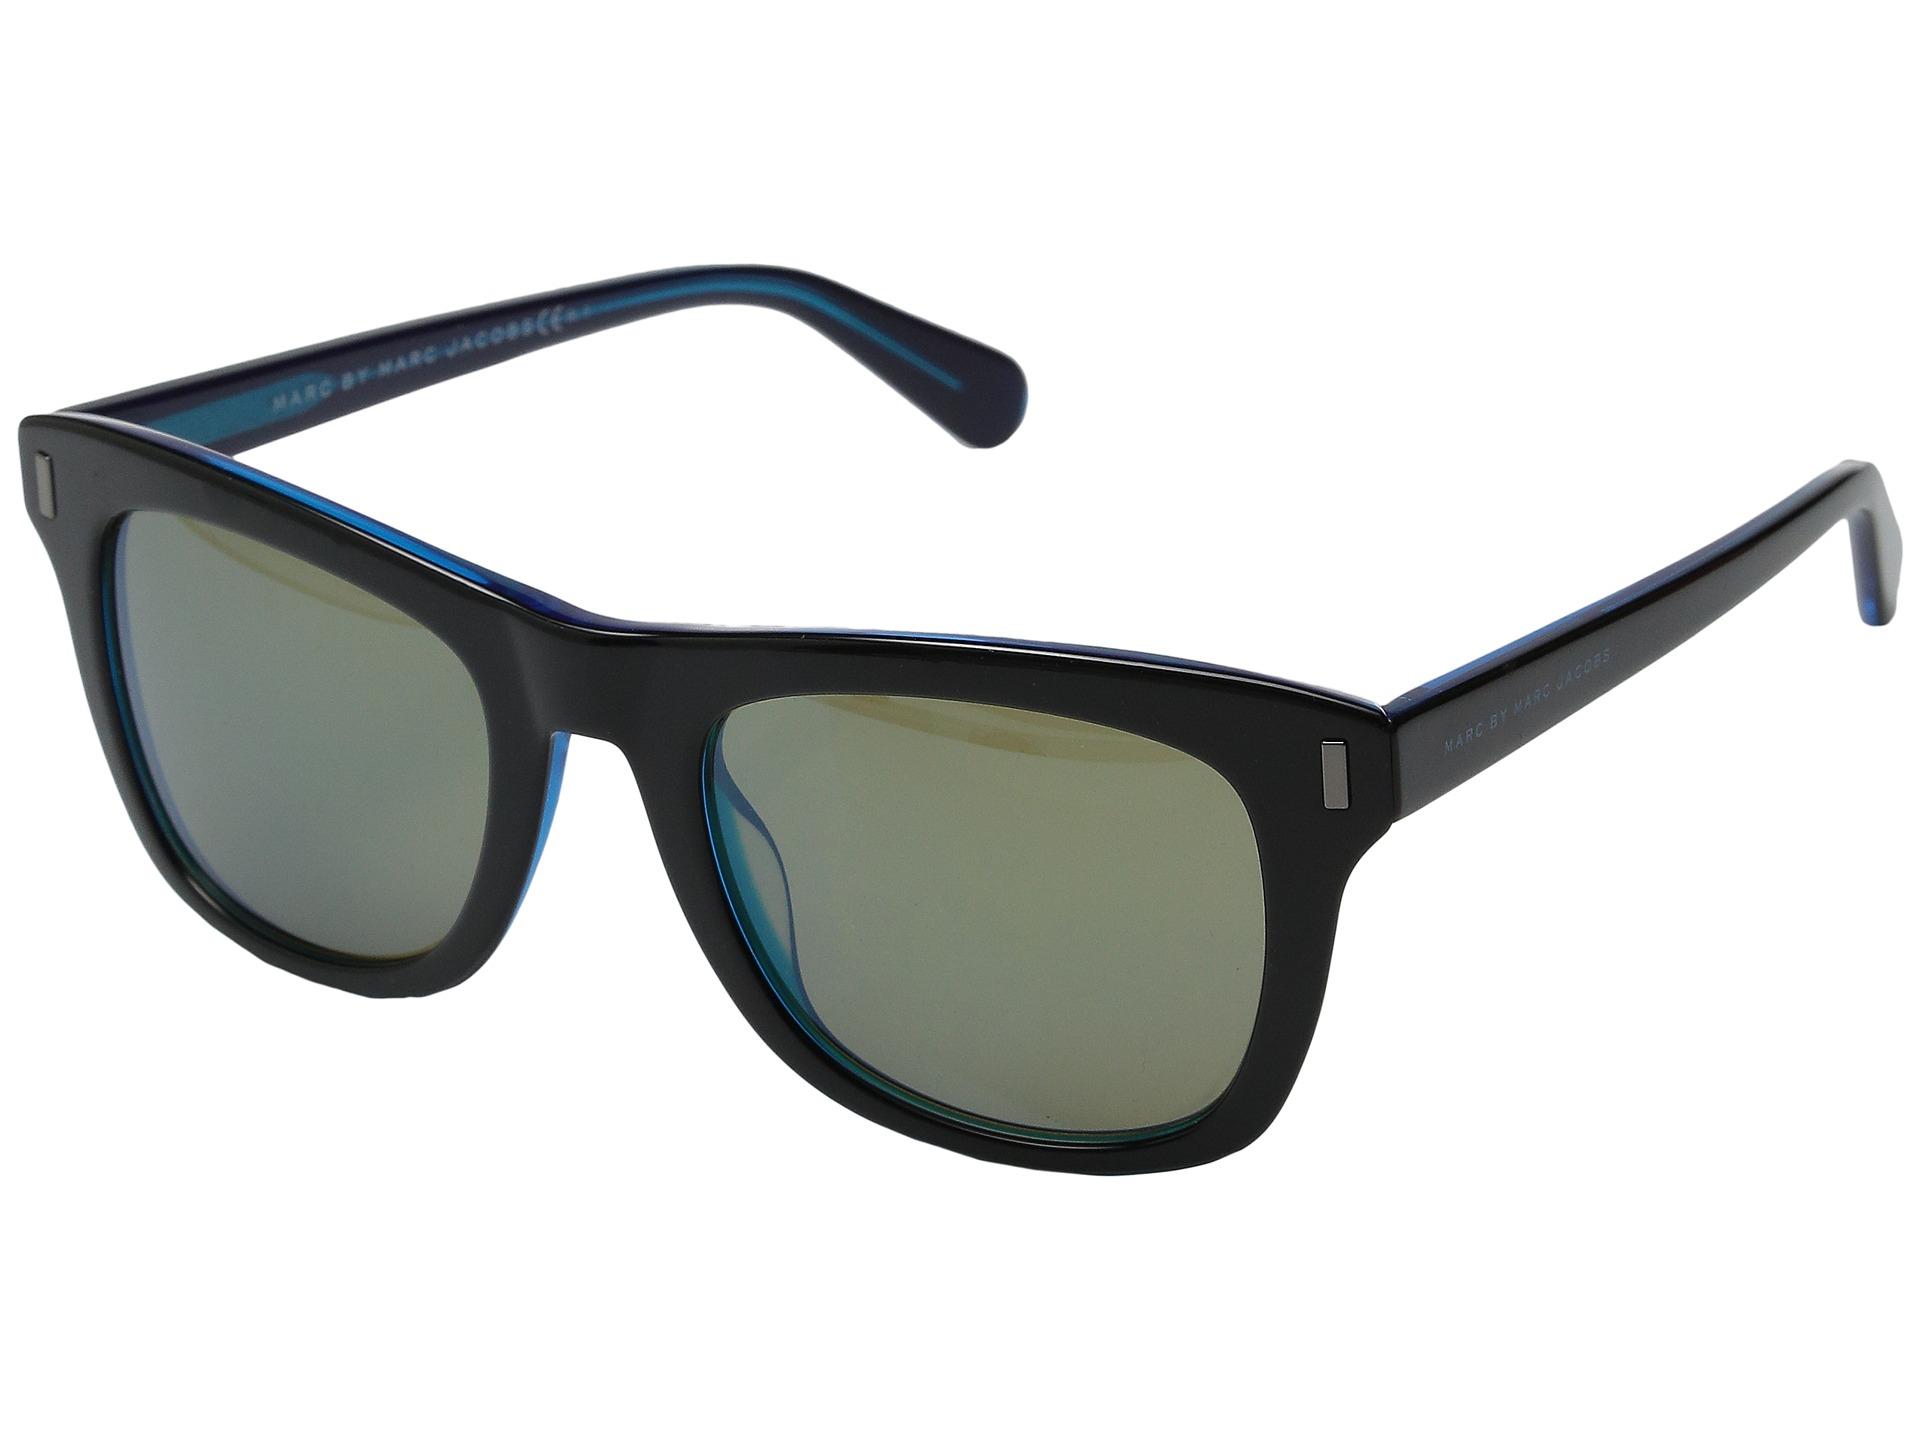 https://cdnc.lystit.com/photos/772e-2015/08/04/marc-by-marc-jacobs-black-bluekhaki-mirror-blue-mmj-432s-black-product-2-119498316-normal.jpeg